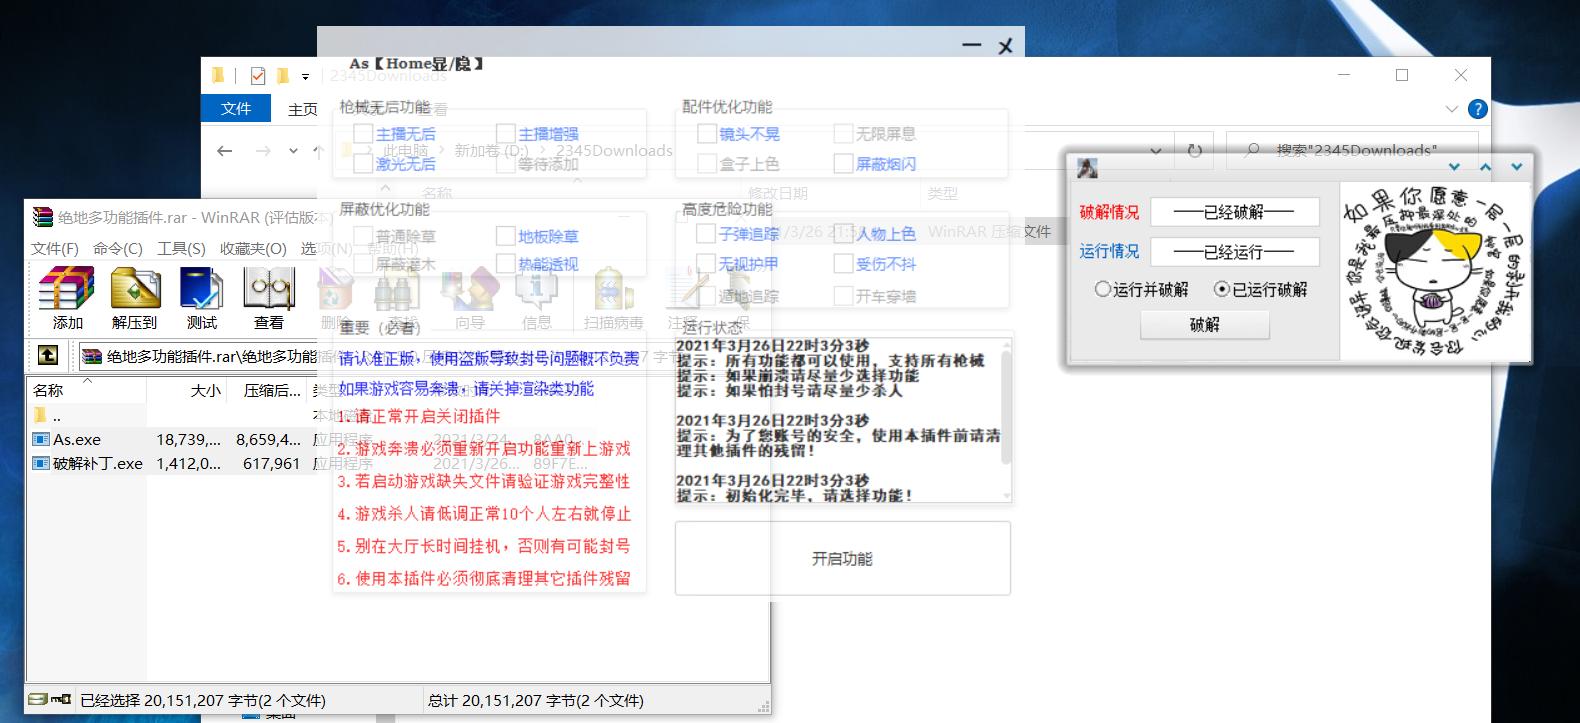 PUBG绝地求生_强强多功能插件V3.27各种变态功能